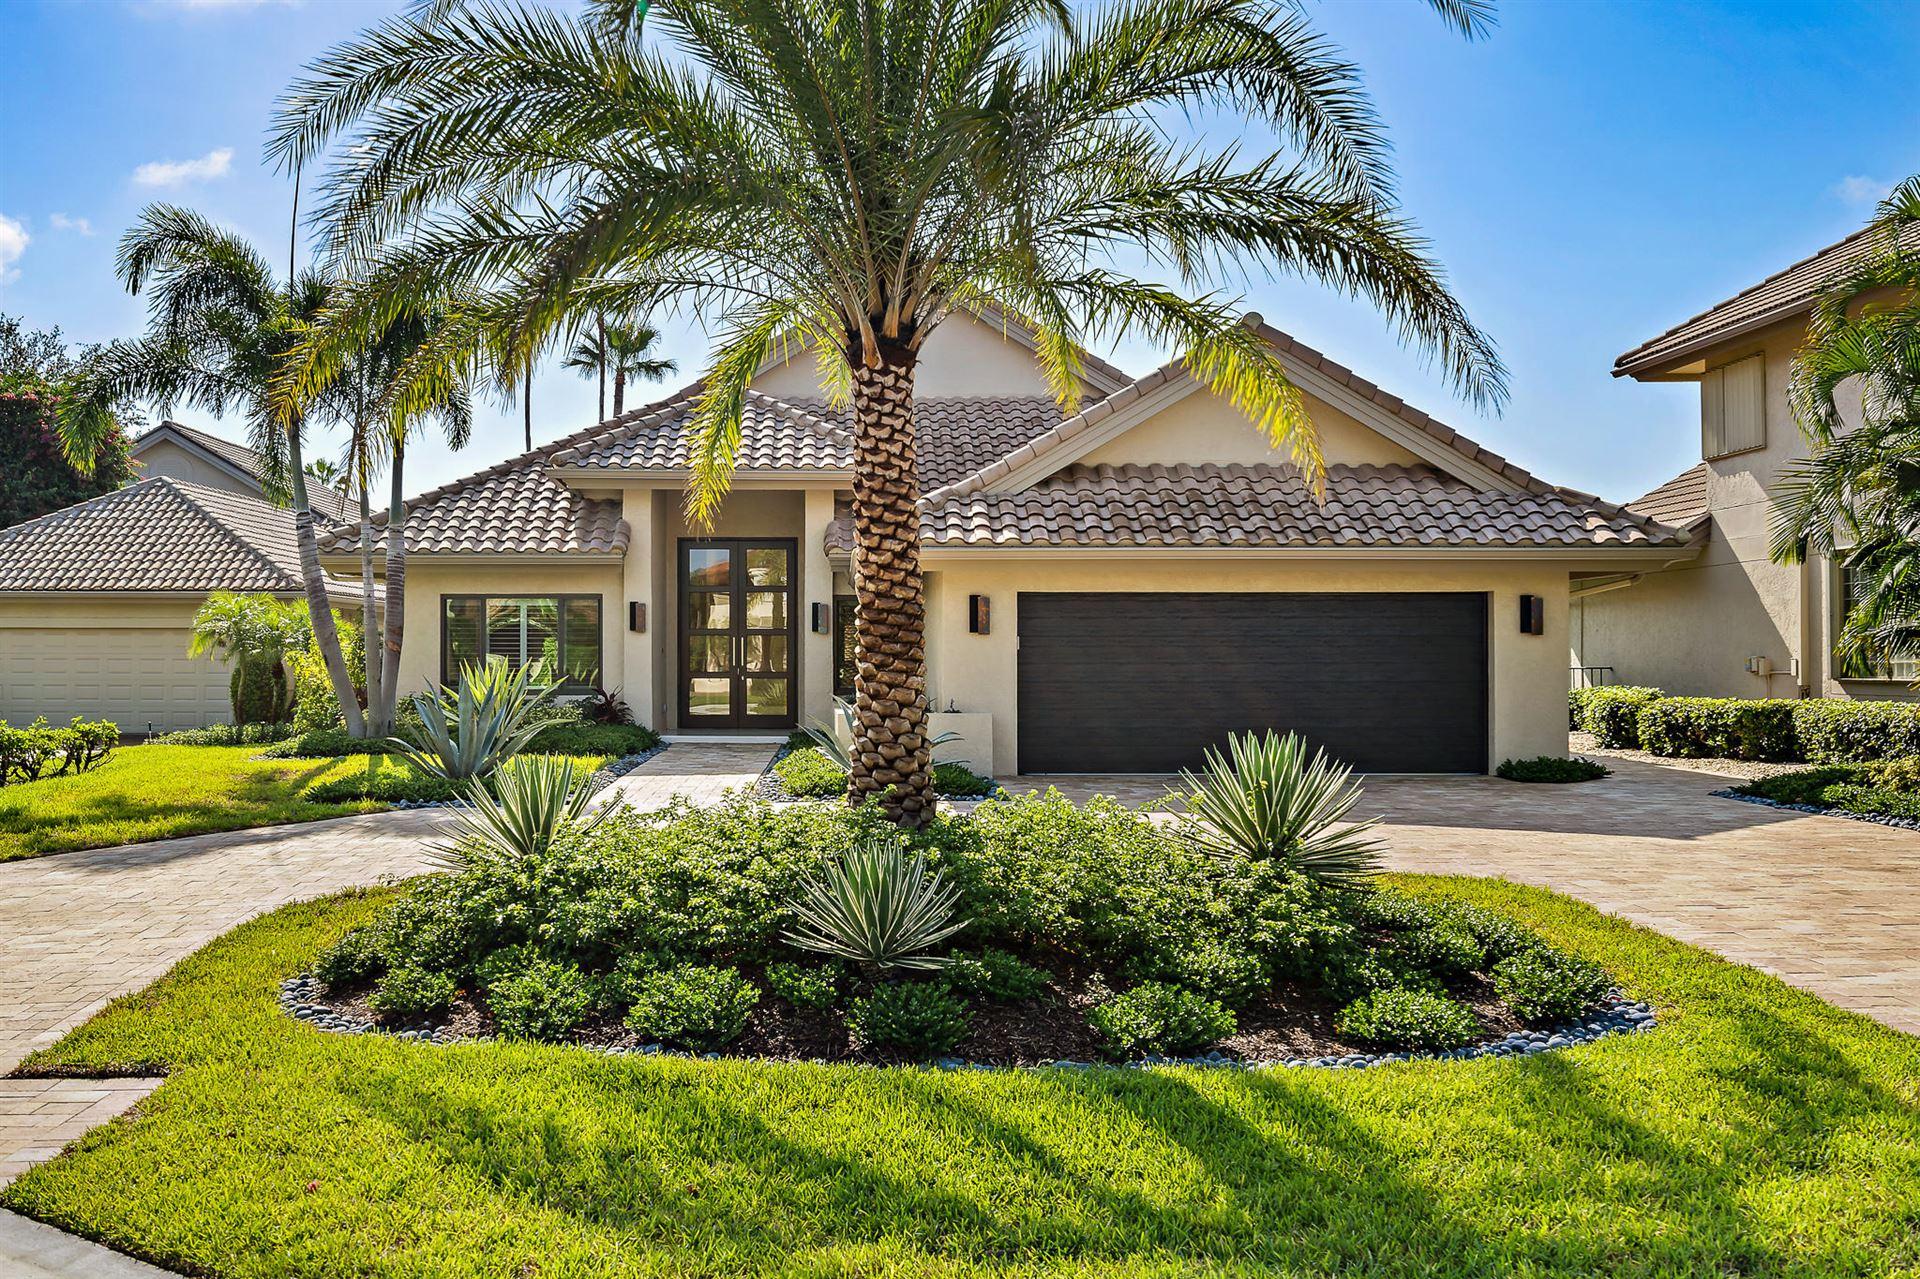 Photo of 13828 Rivoli Drive, Palm Beach Gardens, FL 33410 (MLS # RX-10654861)